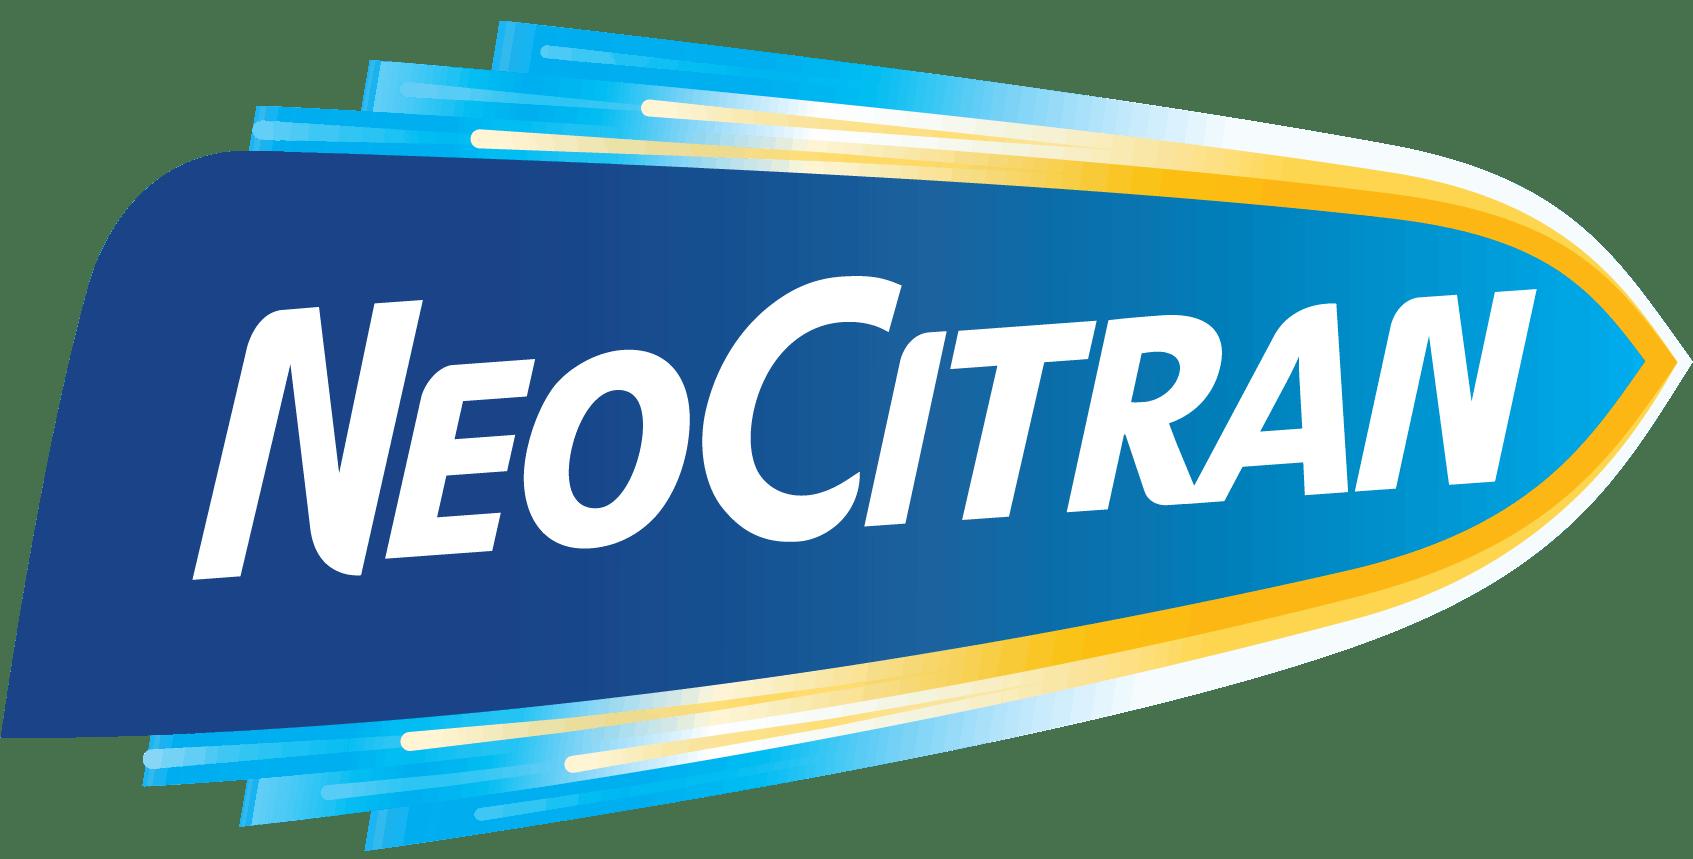 NEOCITRAN logo